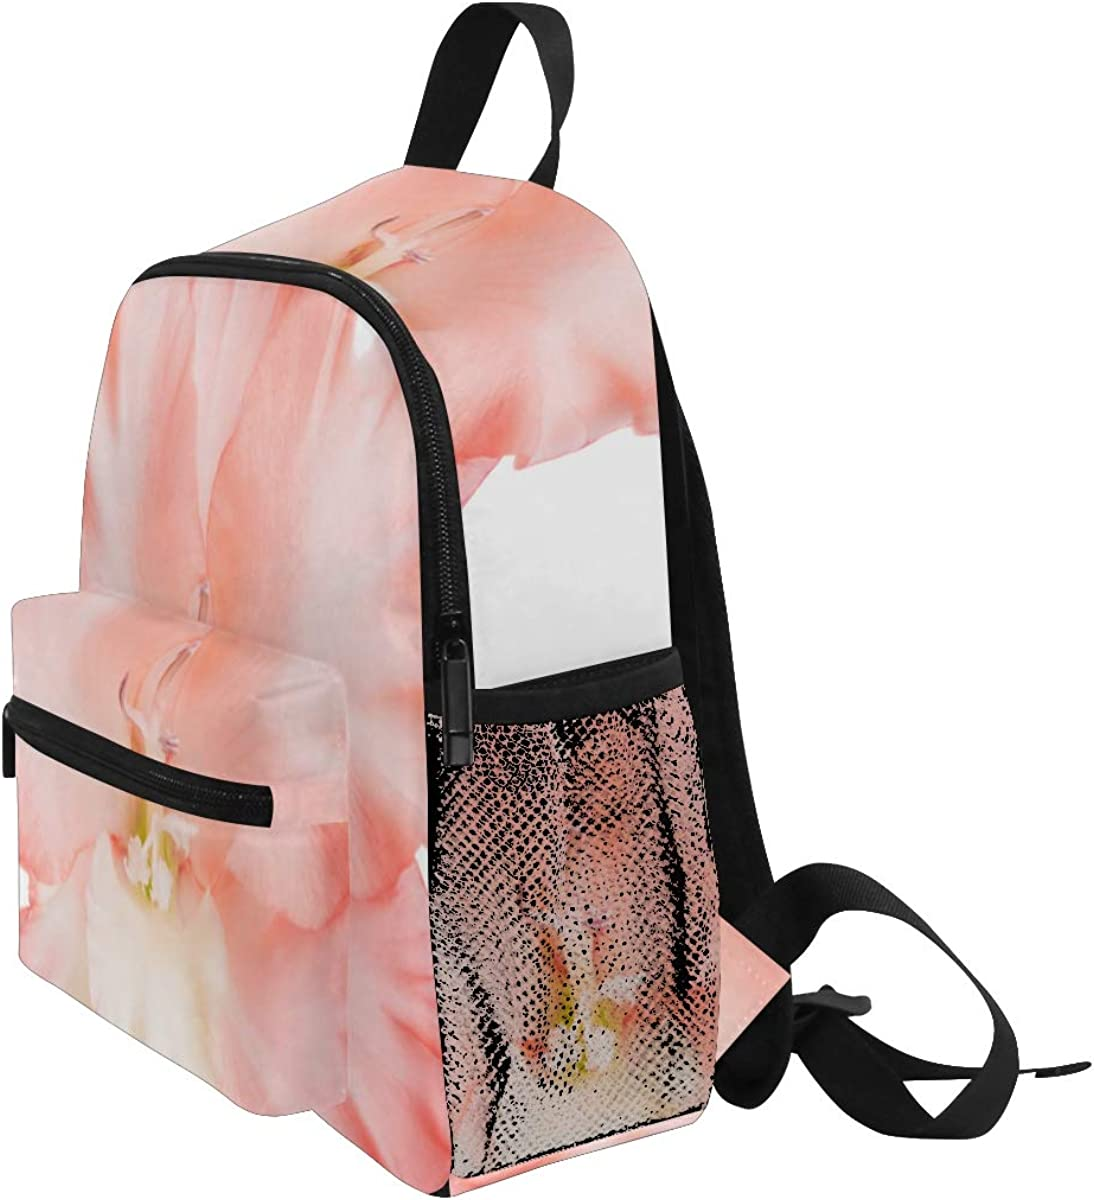 Backpack Cute Kids Backpack Gladiolus Flowers Isolated On White Children Bag Toddler Backpack Bookbag School Bag